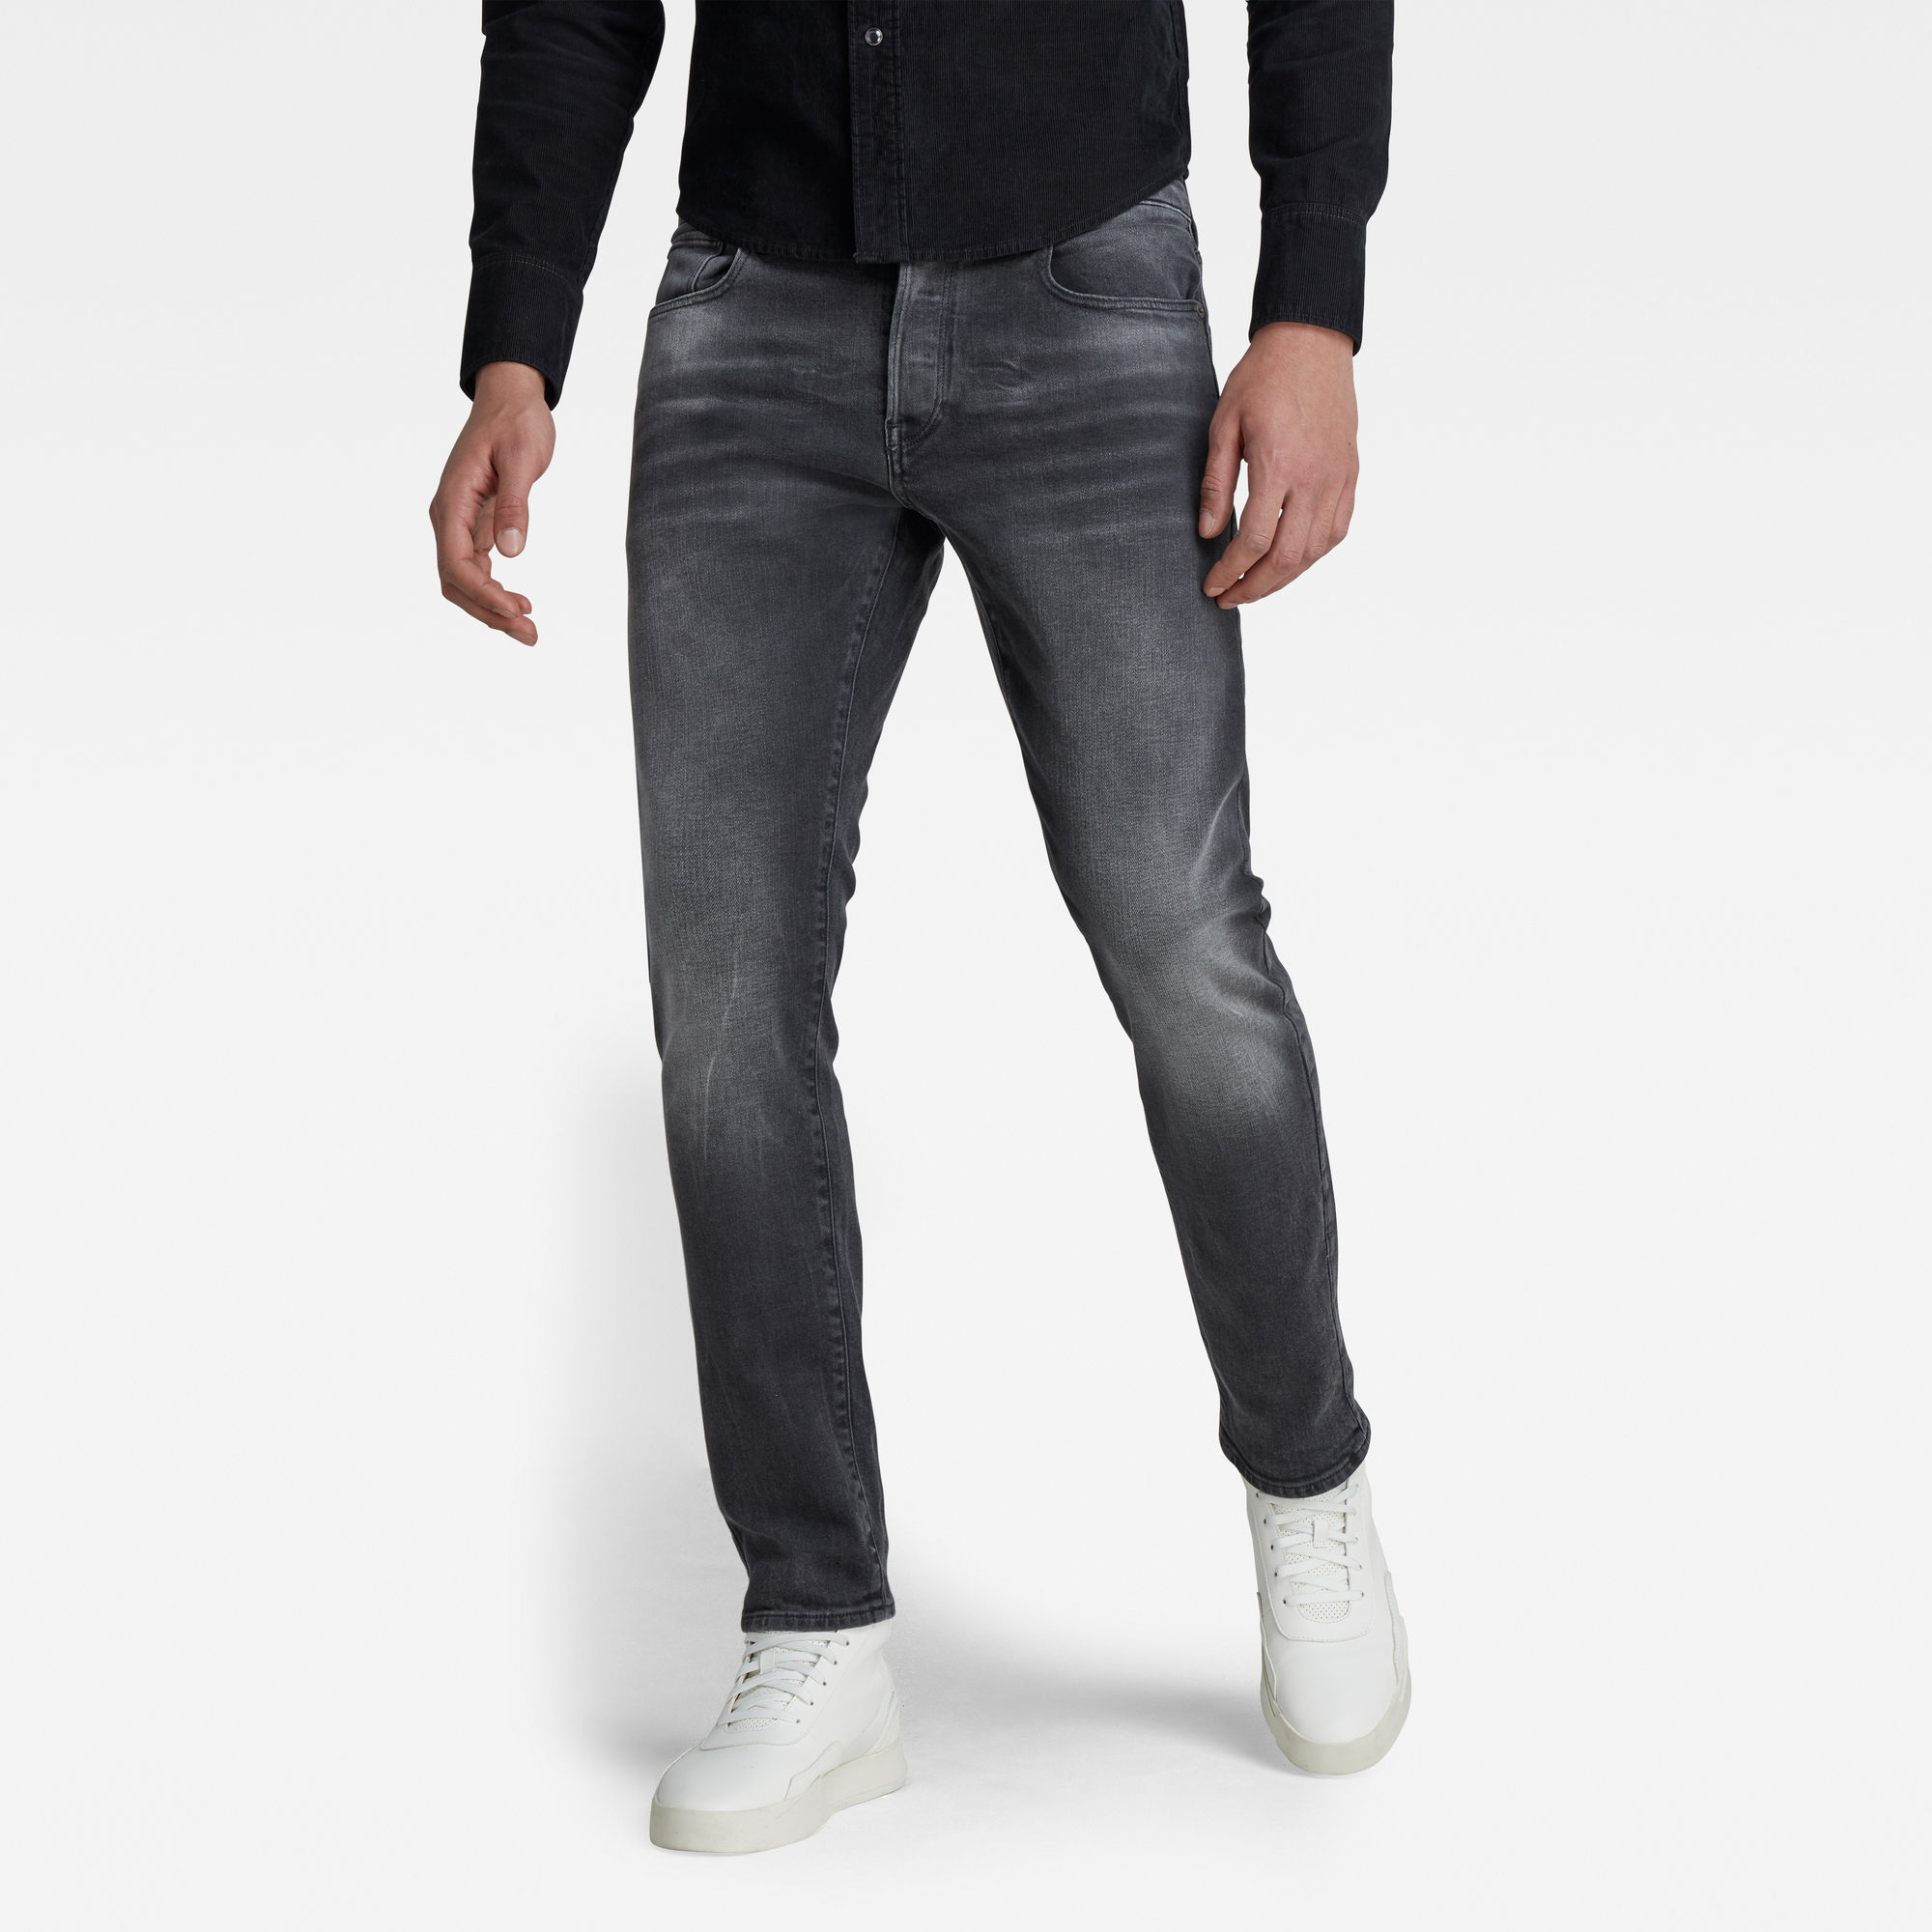 G-Star RAW Heren 3301 Slim Jeans Zwart